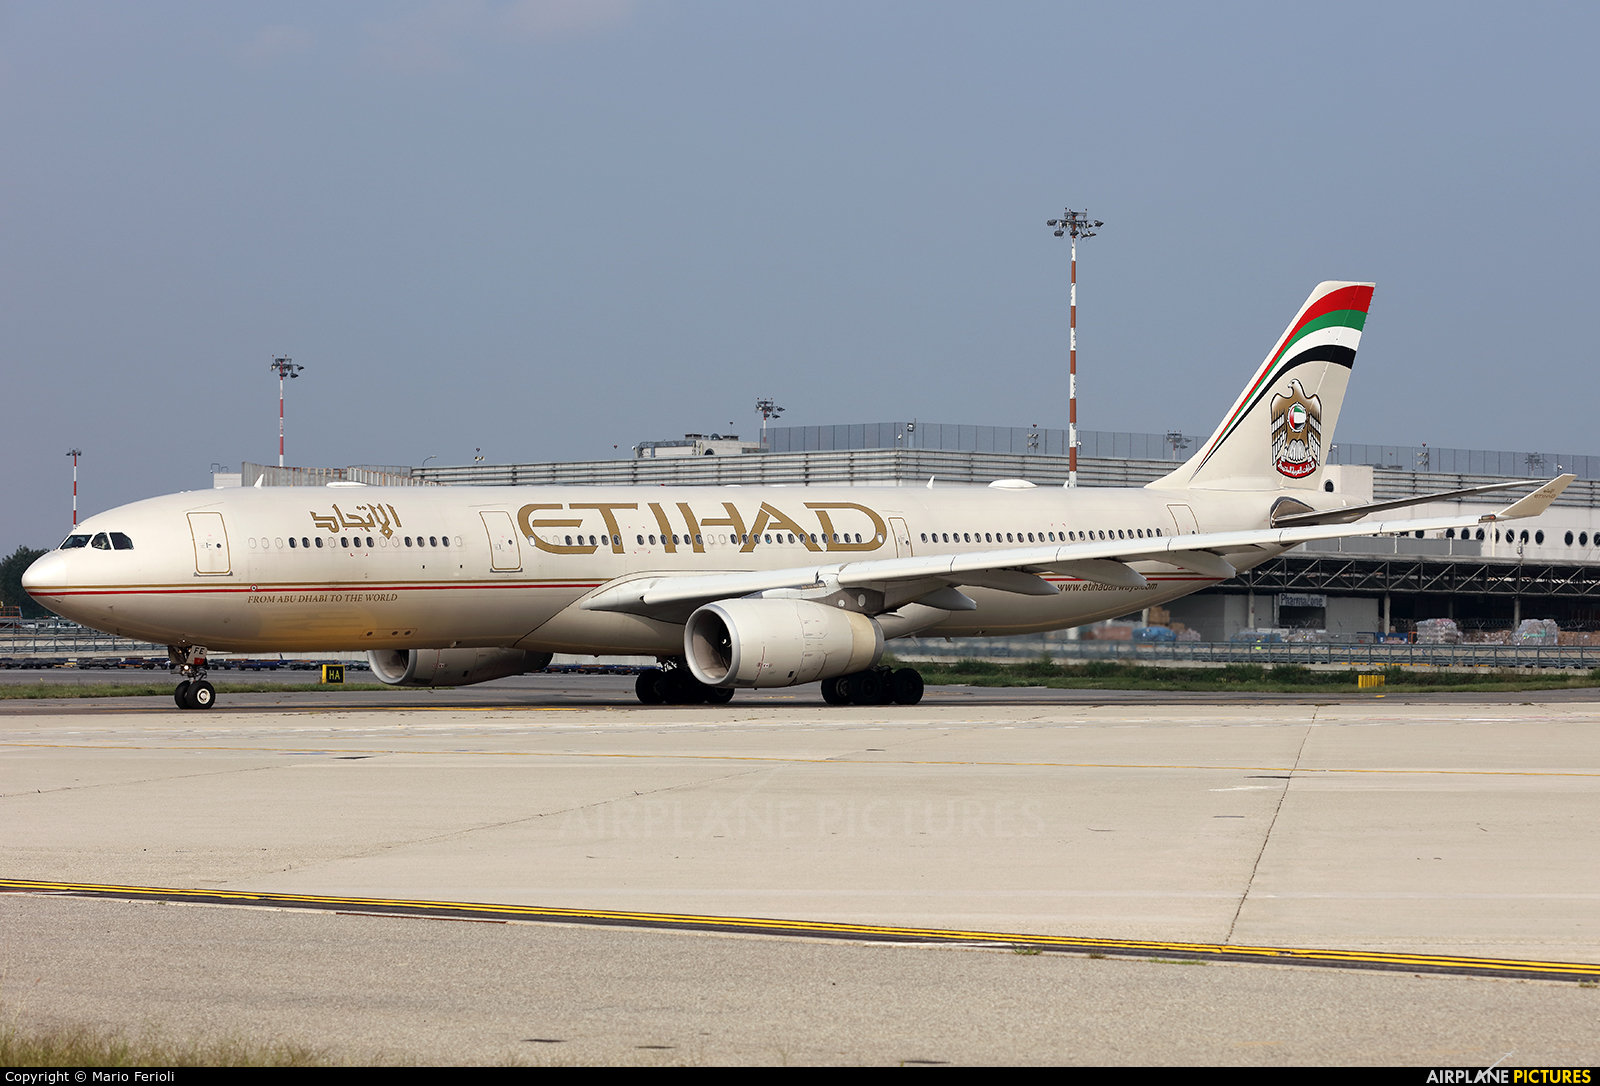 Etihad Airways A6-AFE aircraft at Milan - Malpensa